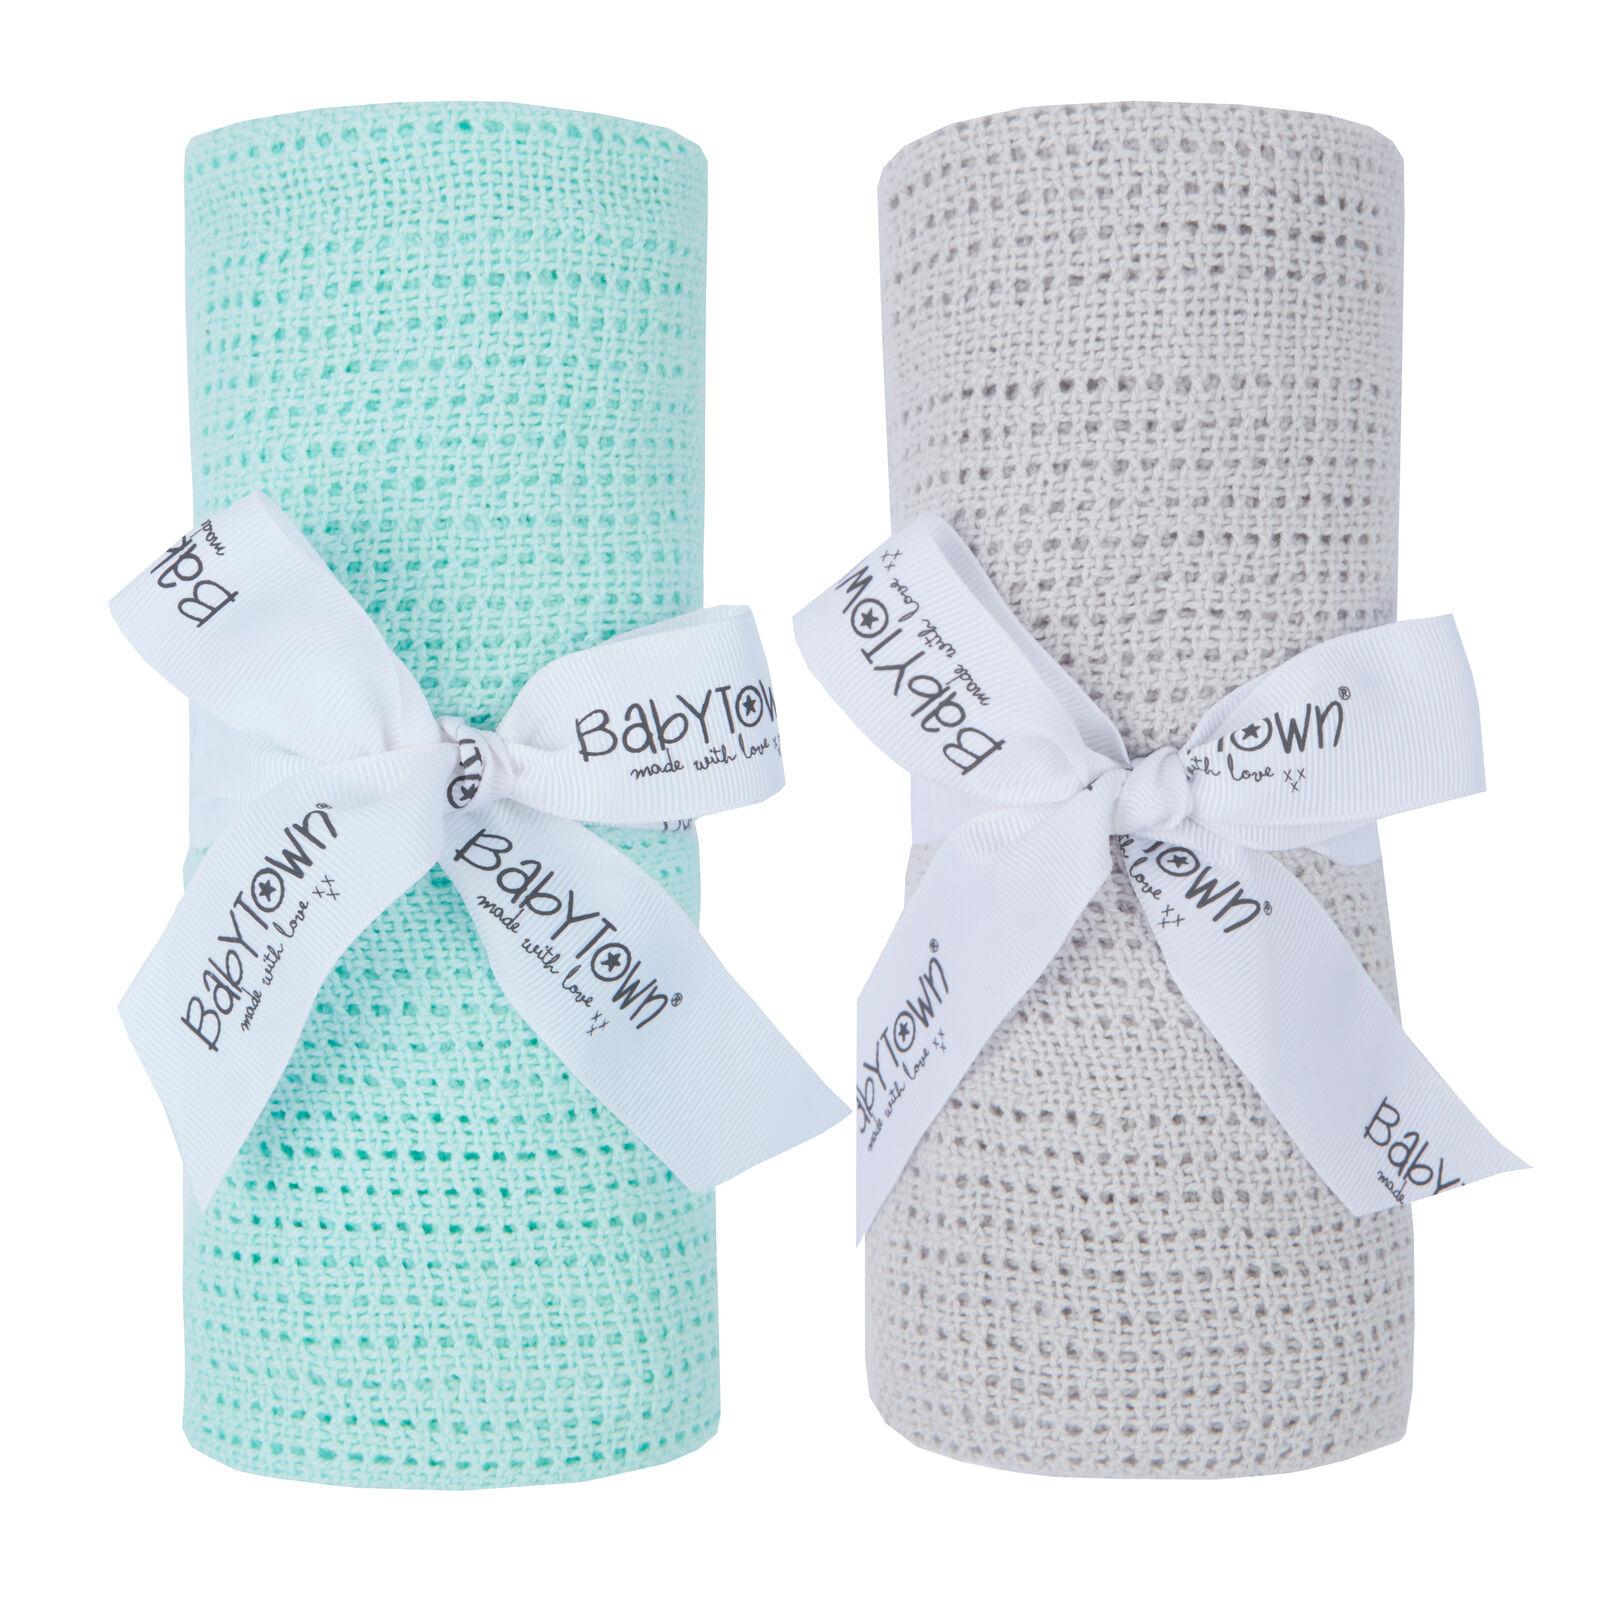 Baby Boys and Girls Soft Cellular Blanket Cotton Pram Cot Moses Basket Crib Wrap